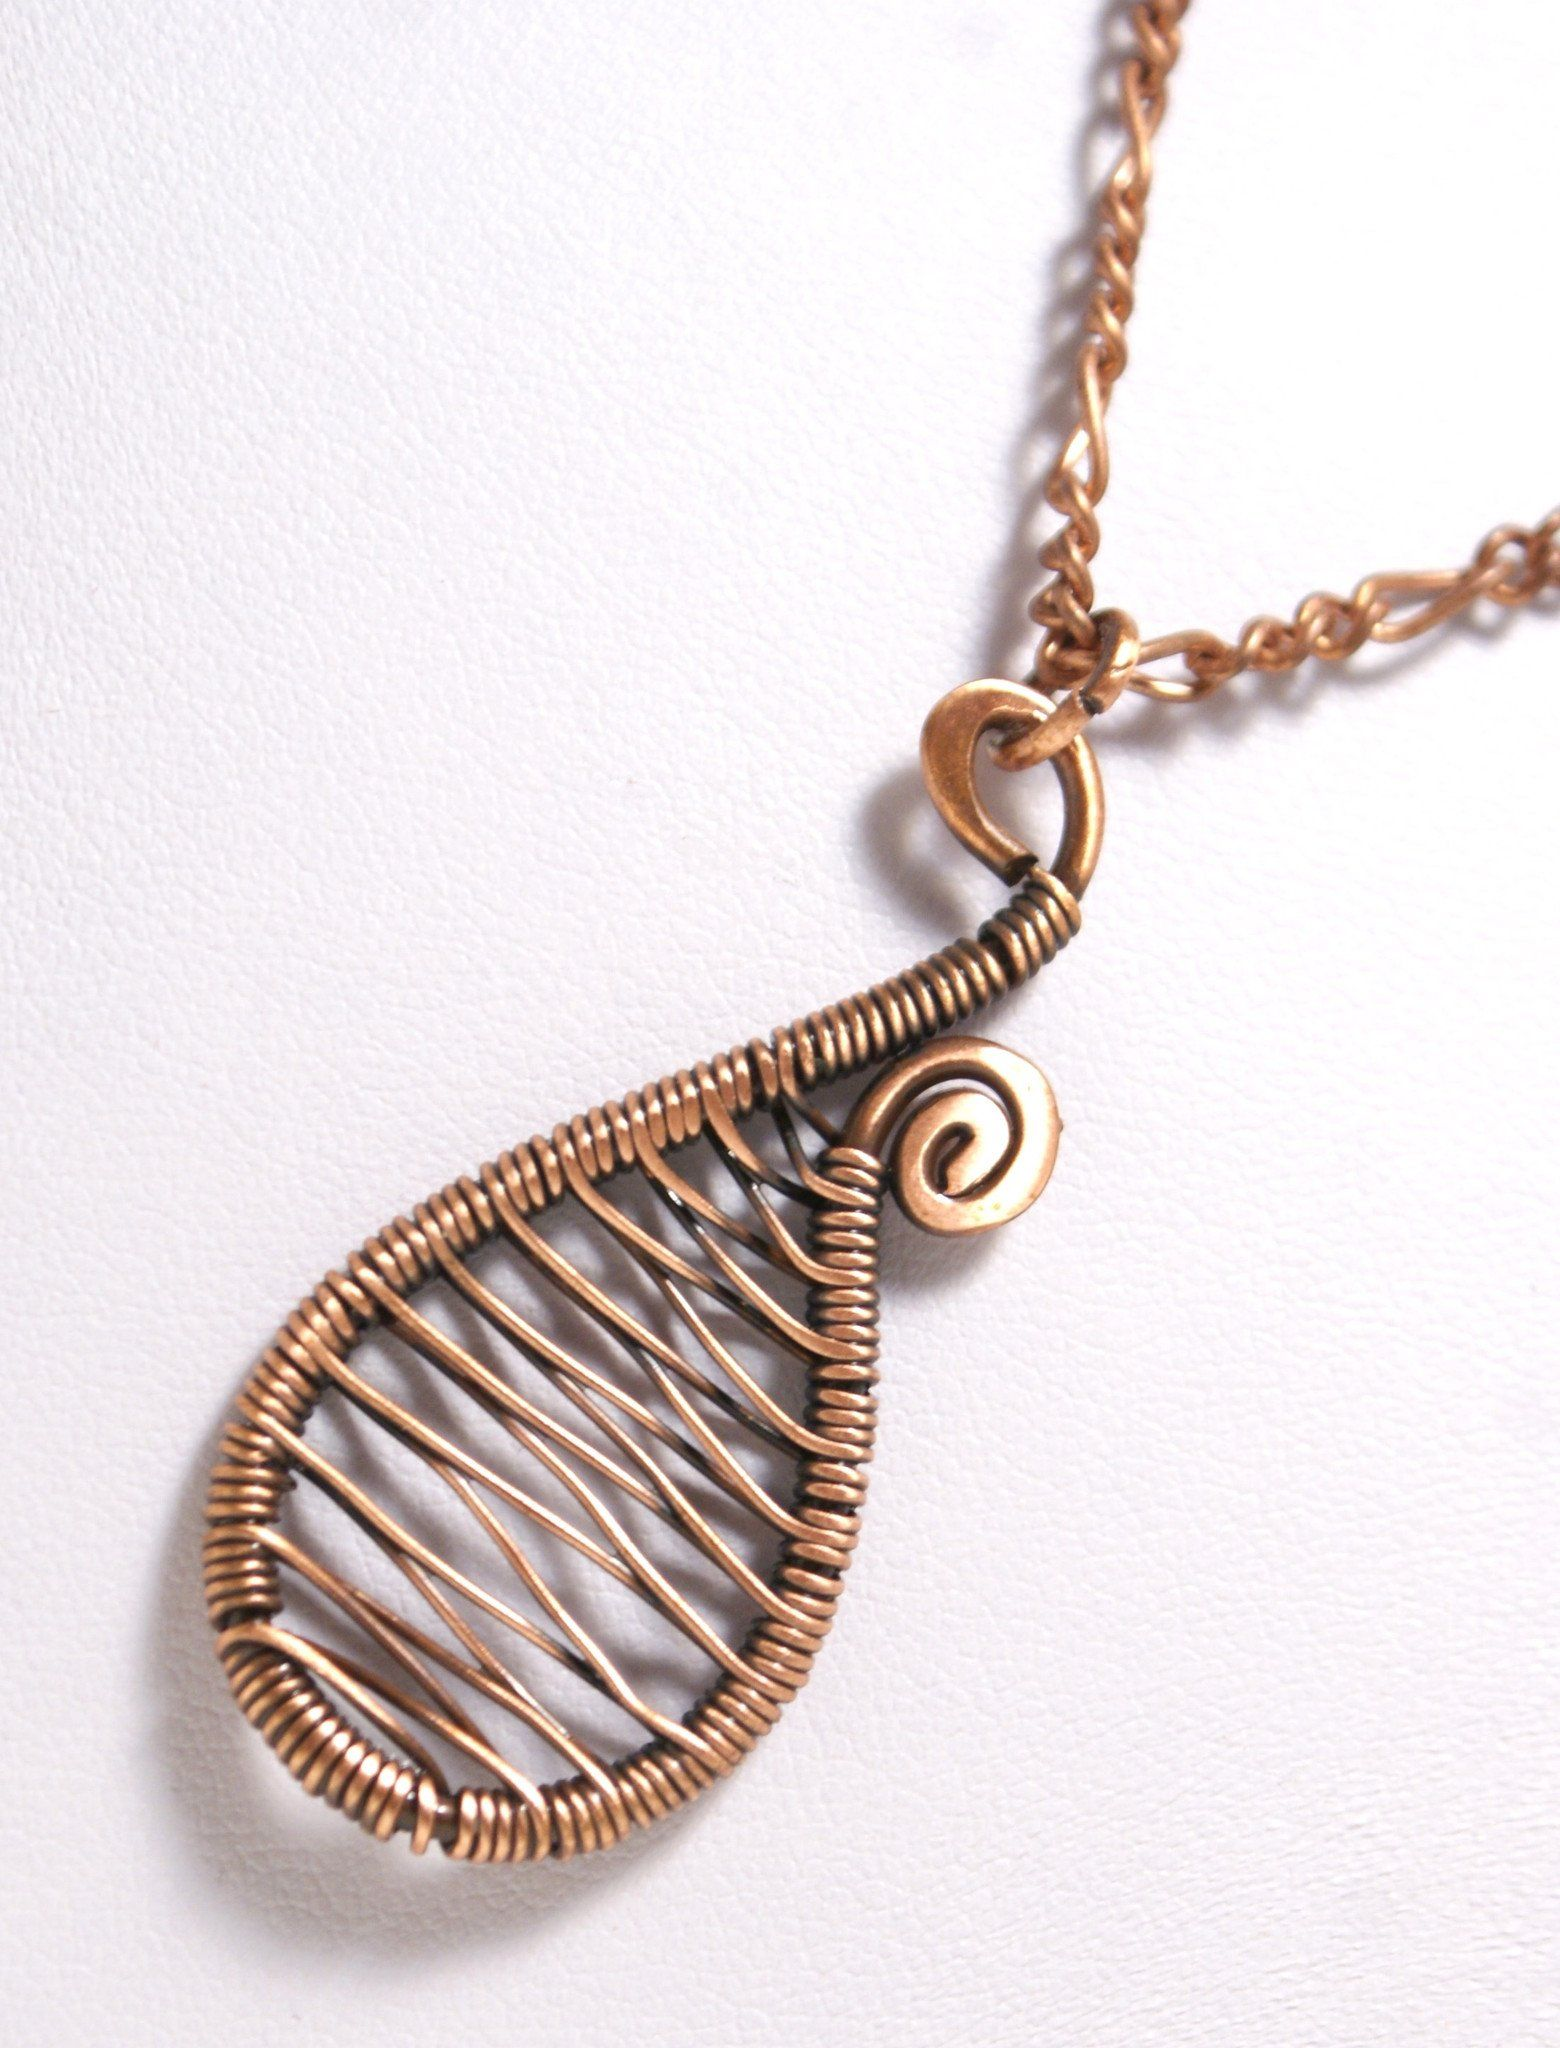 Handmade Copper Pendant Wire Wrapped Copper Pendant Necklace